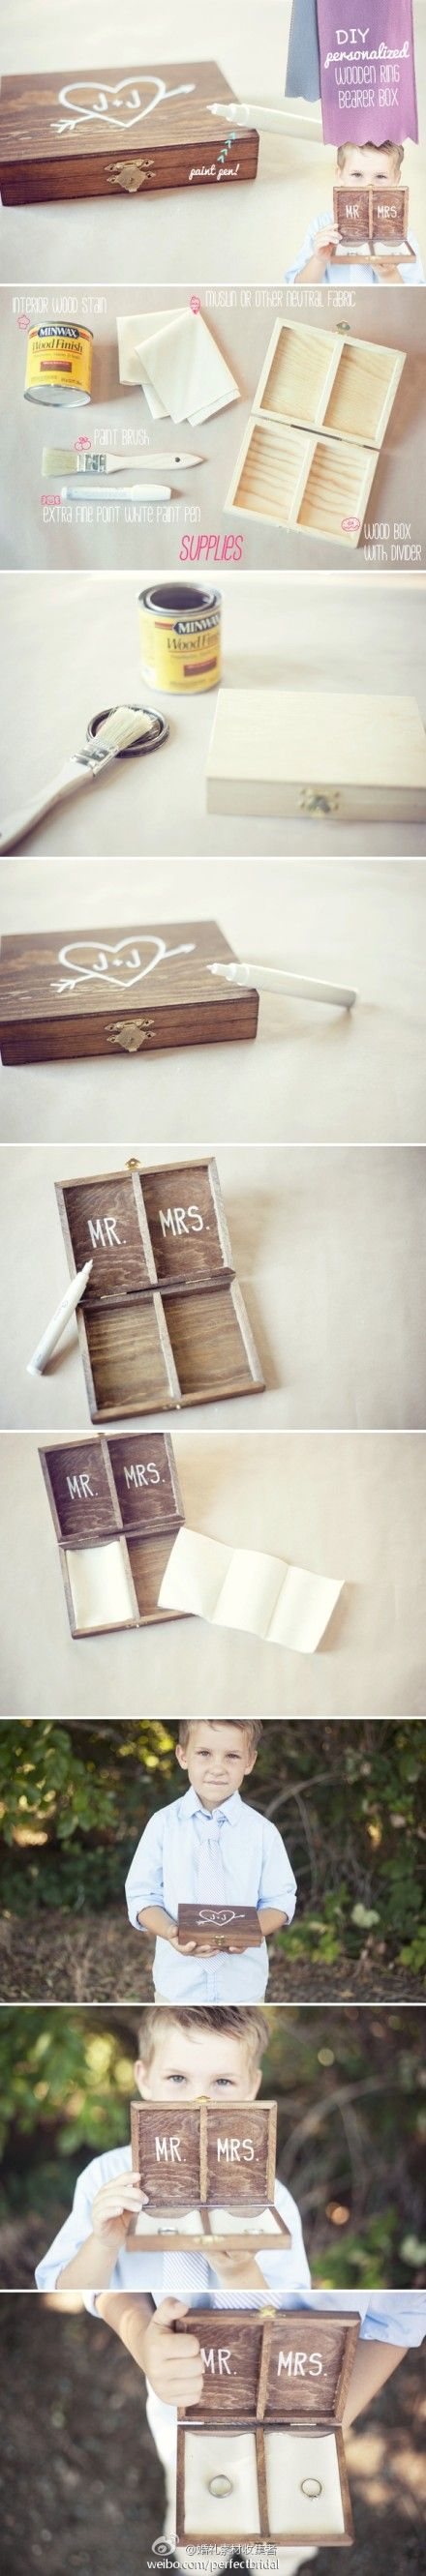 Wedding gift ideas diy ring bearer box easy diy gifts